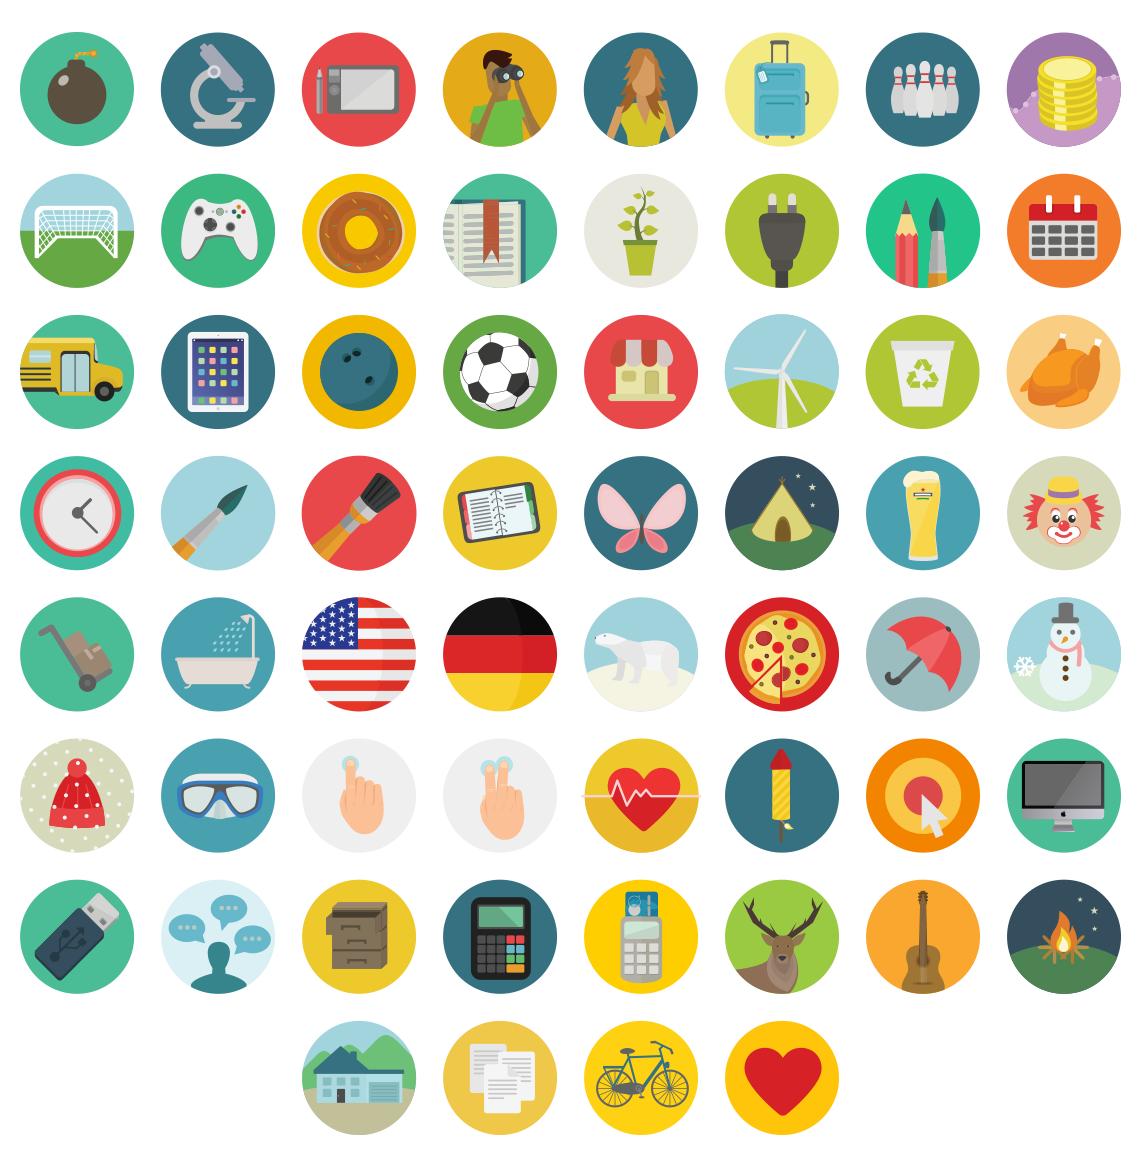 1000 images about free icons on pinterest free icon flat icons and icon set basic icons flat icons 1000